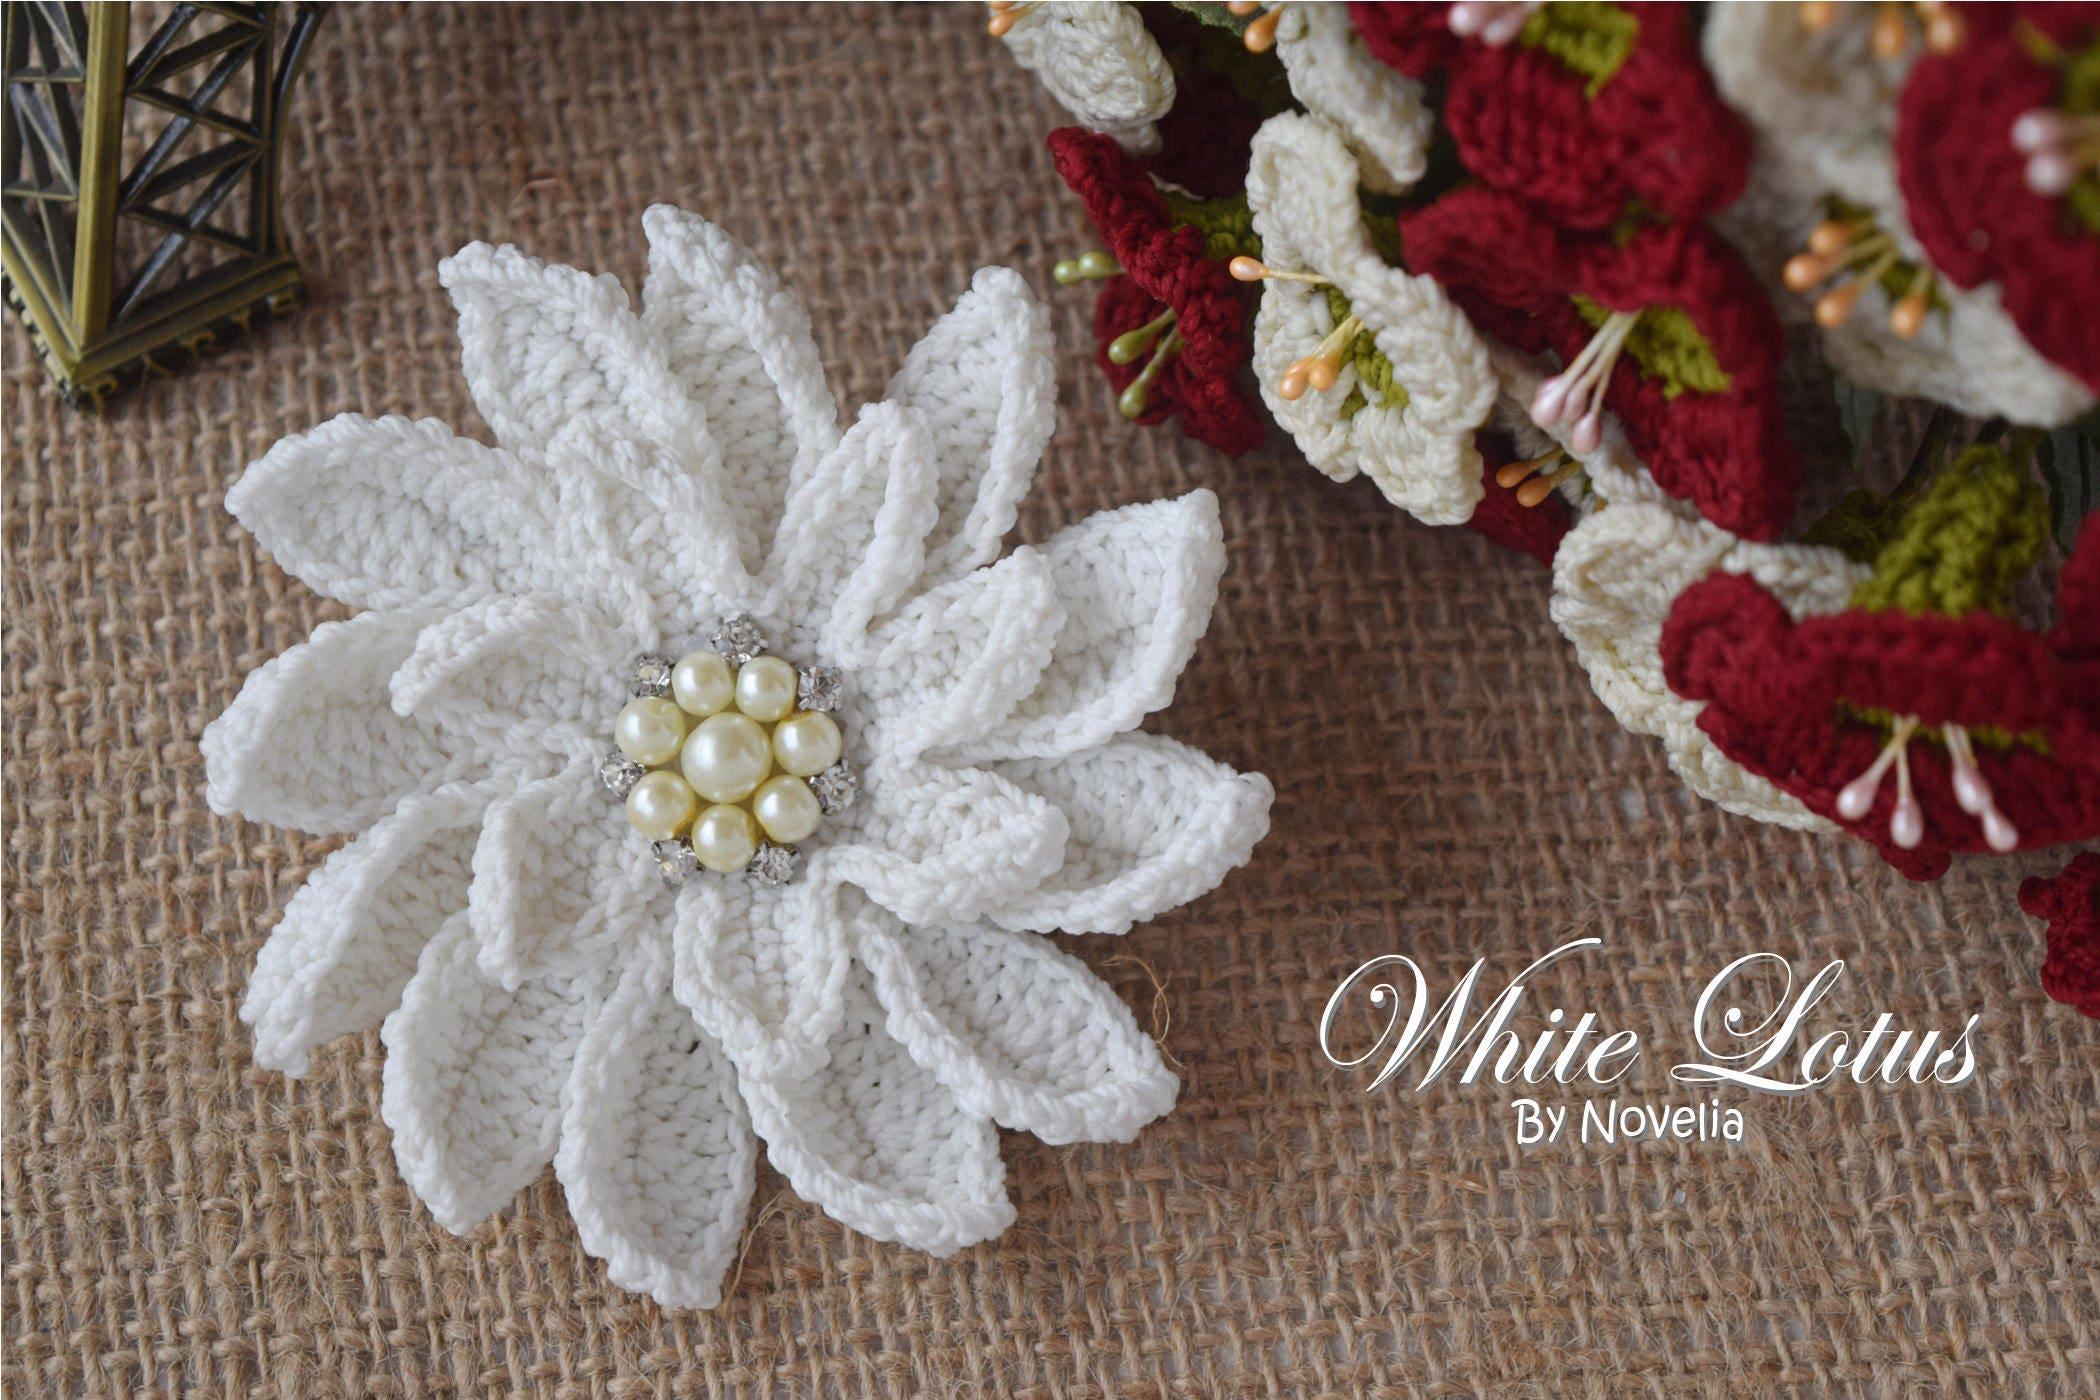 PATTERN Crochet Flower White Lotus Wedding Accessories Hairpin ...